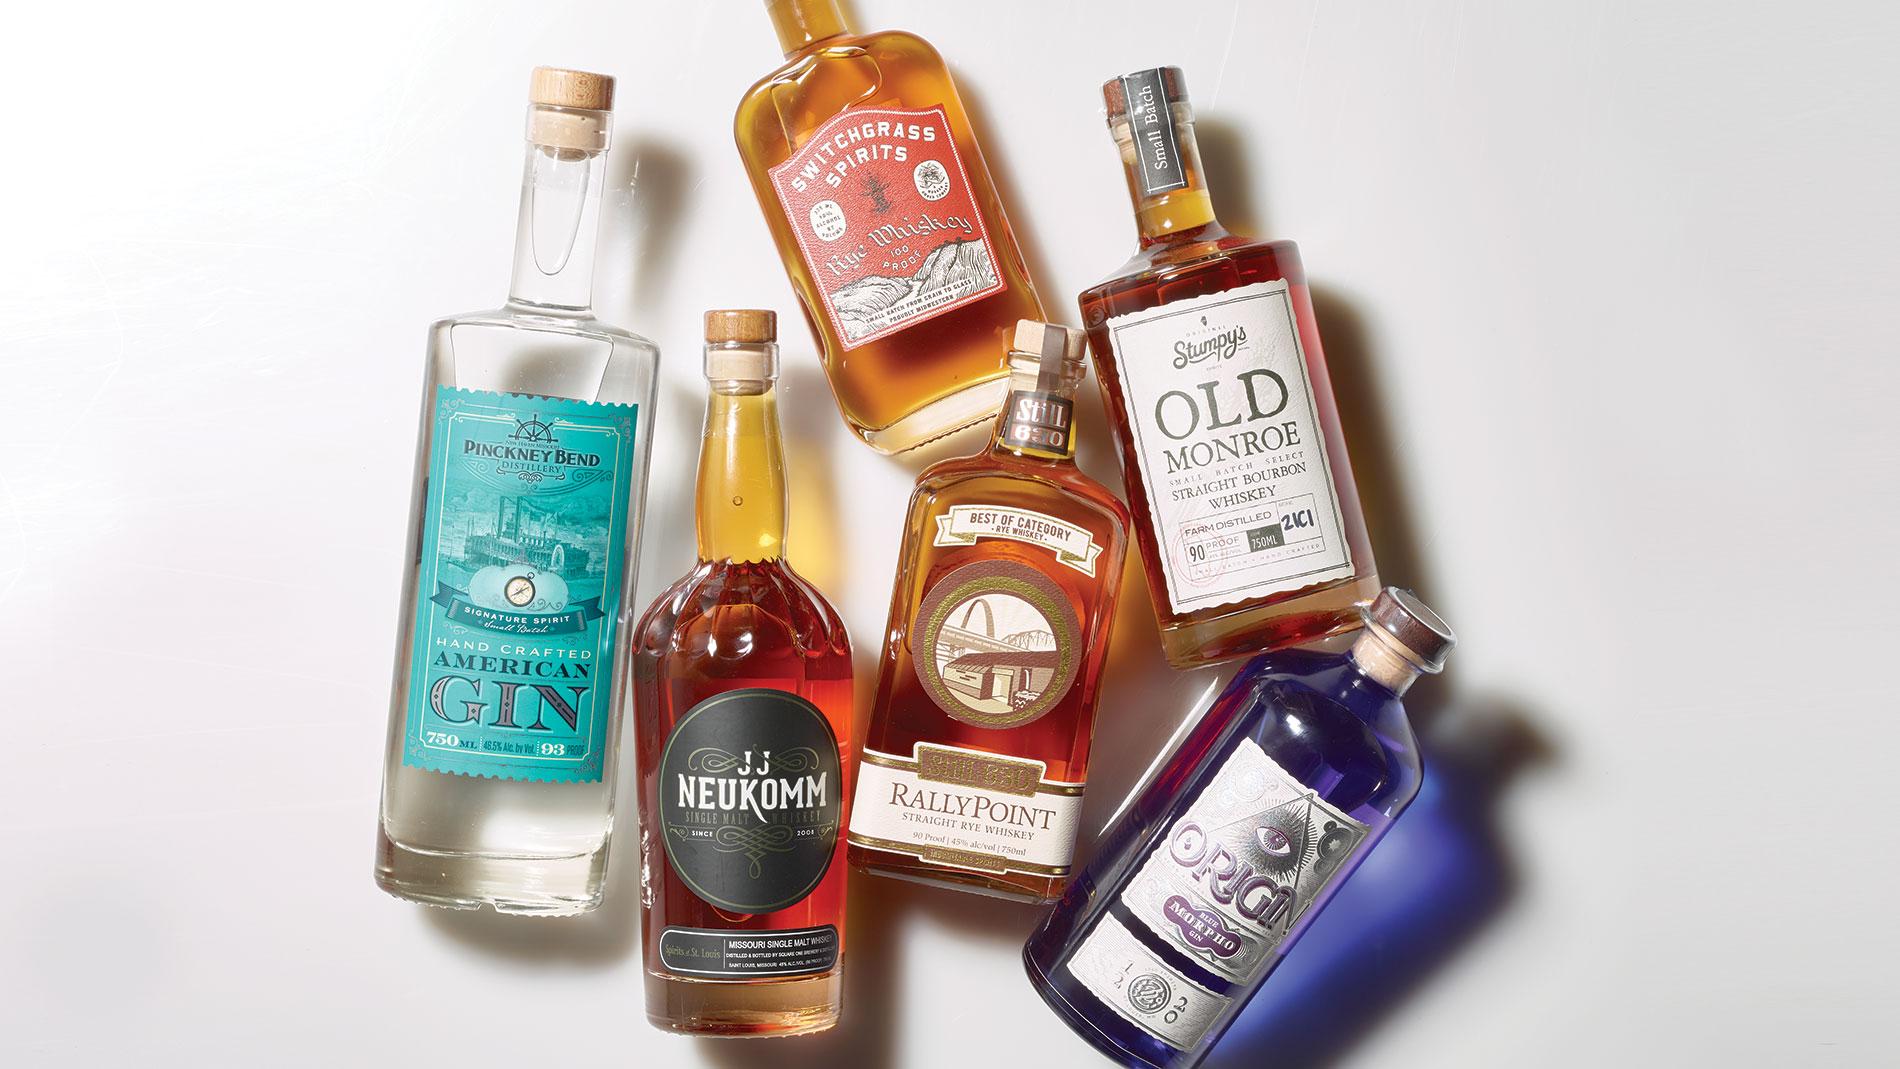 6 Readers' Choice Award-winning St. Louis-made spirits